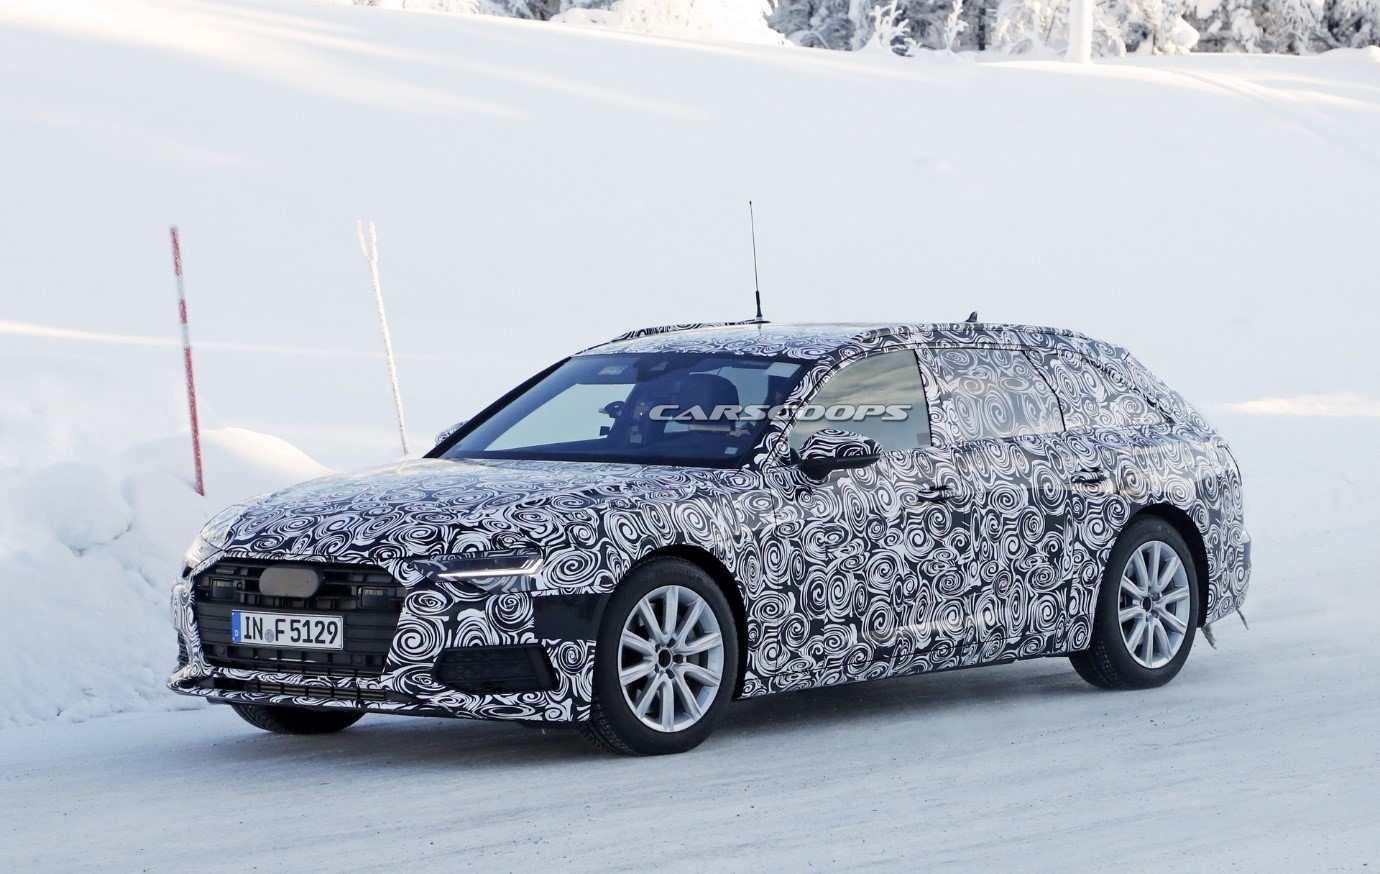 21 Gallery of New Audi A6 2019 Interior Spy Shoot Performance and New Engine for New Audi A6 2019 Interior Spy Shoot